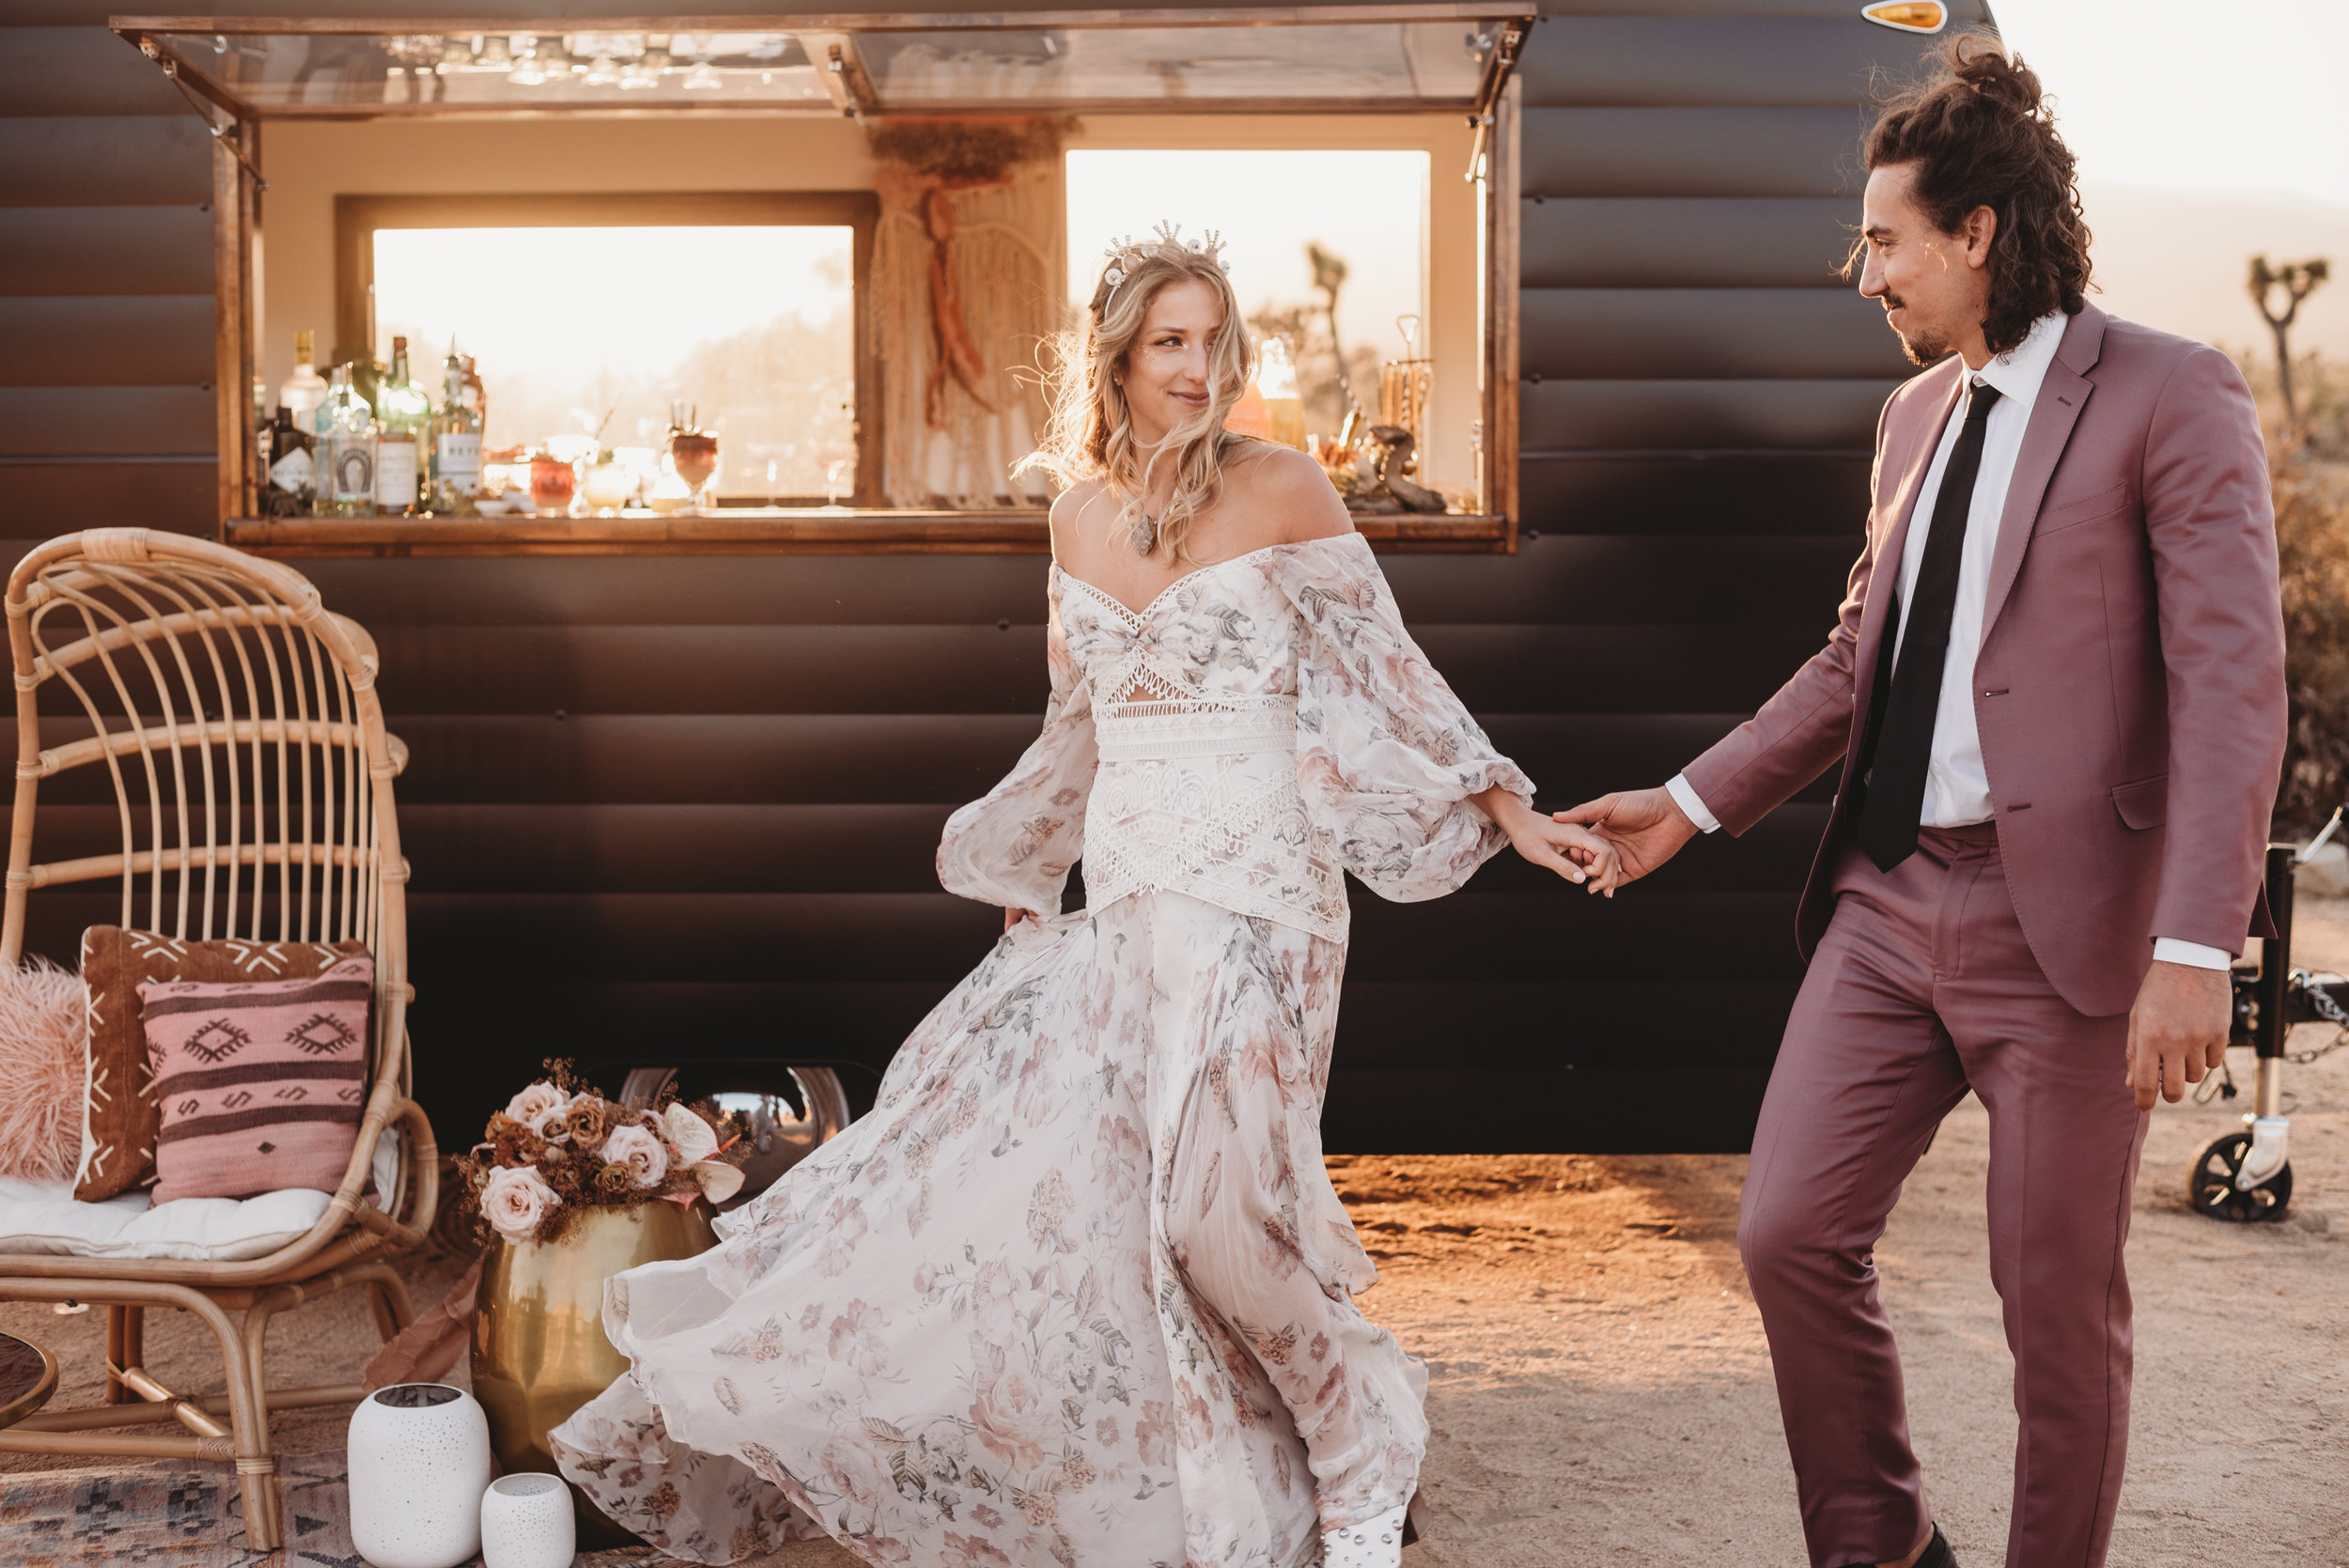 FortSt.John_photographer_TyraEPhotography_Wedding_Couple_Family_Photograhy_DawsonCreek_Elopement_Bride_Boduoir_Portraits-8384.jpg